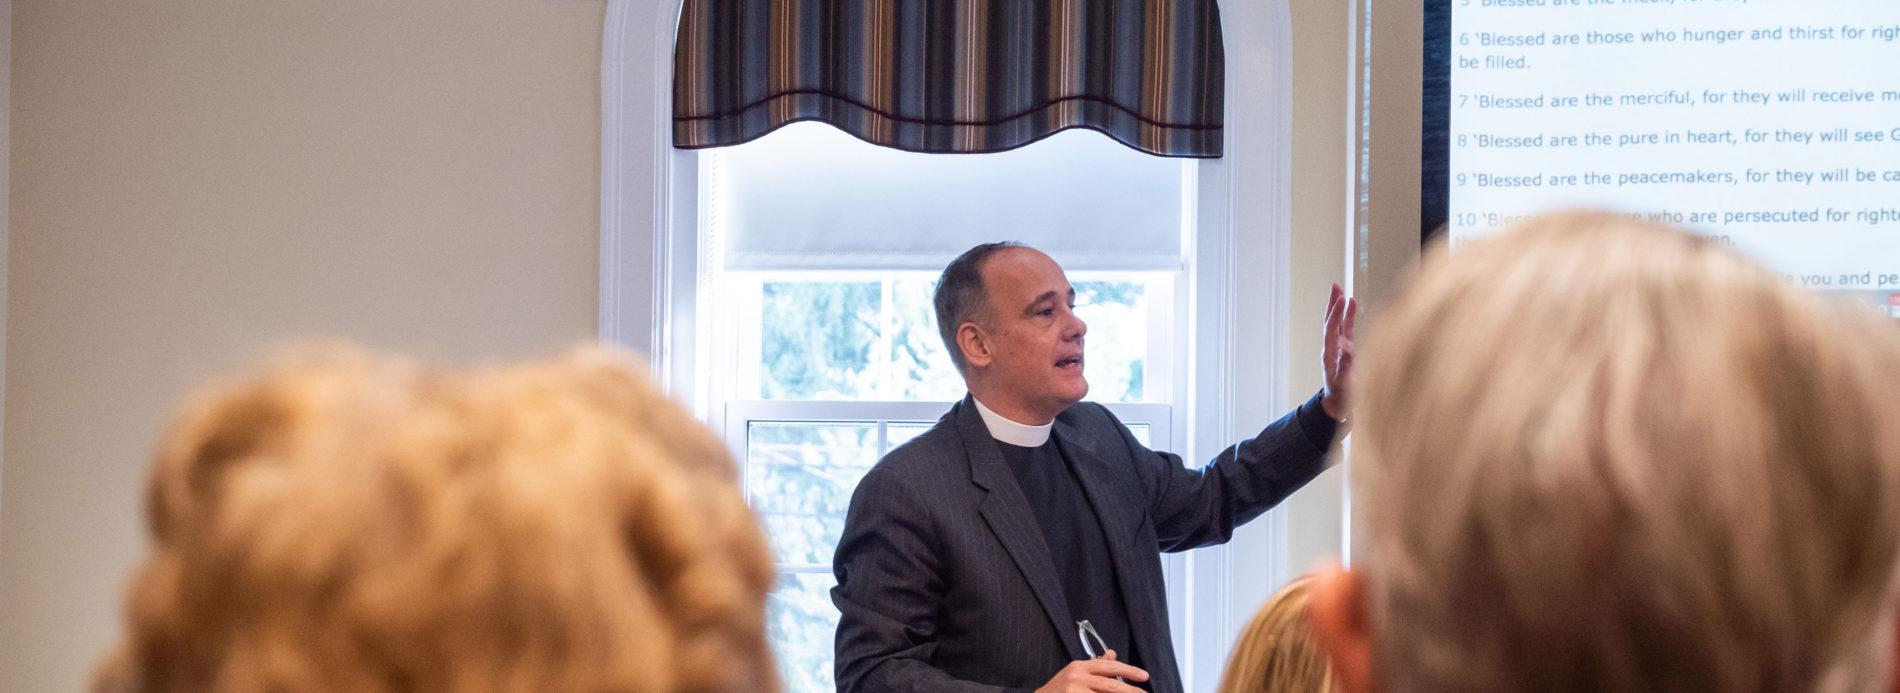 Rev. Ken Kovacs discusses the Beatitudes.